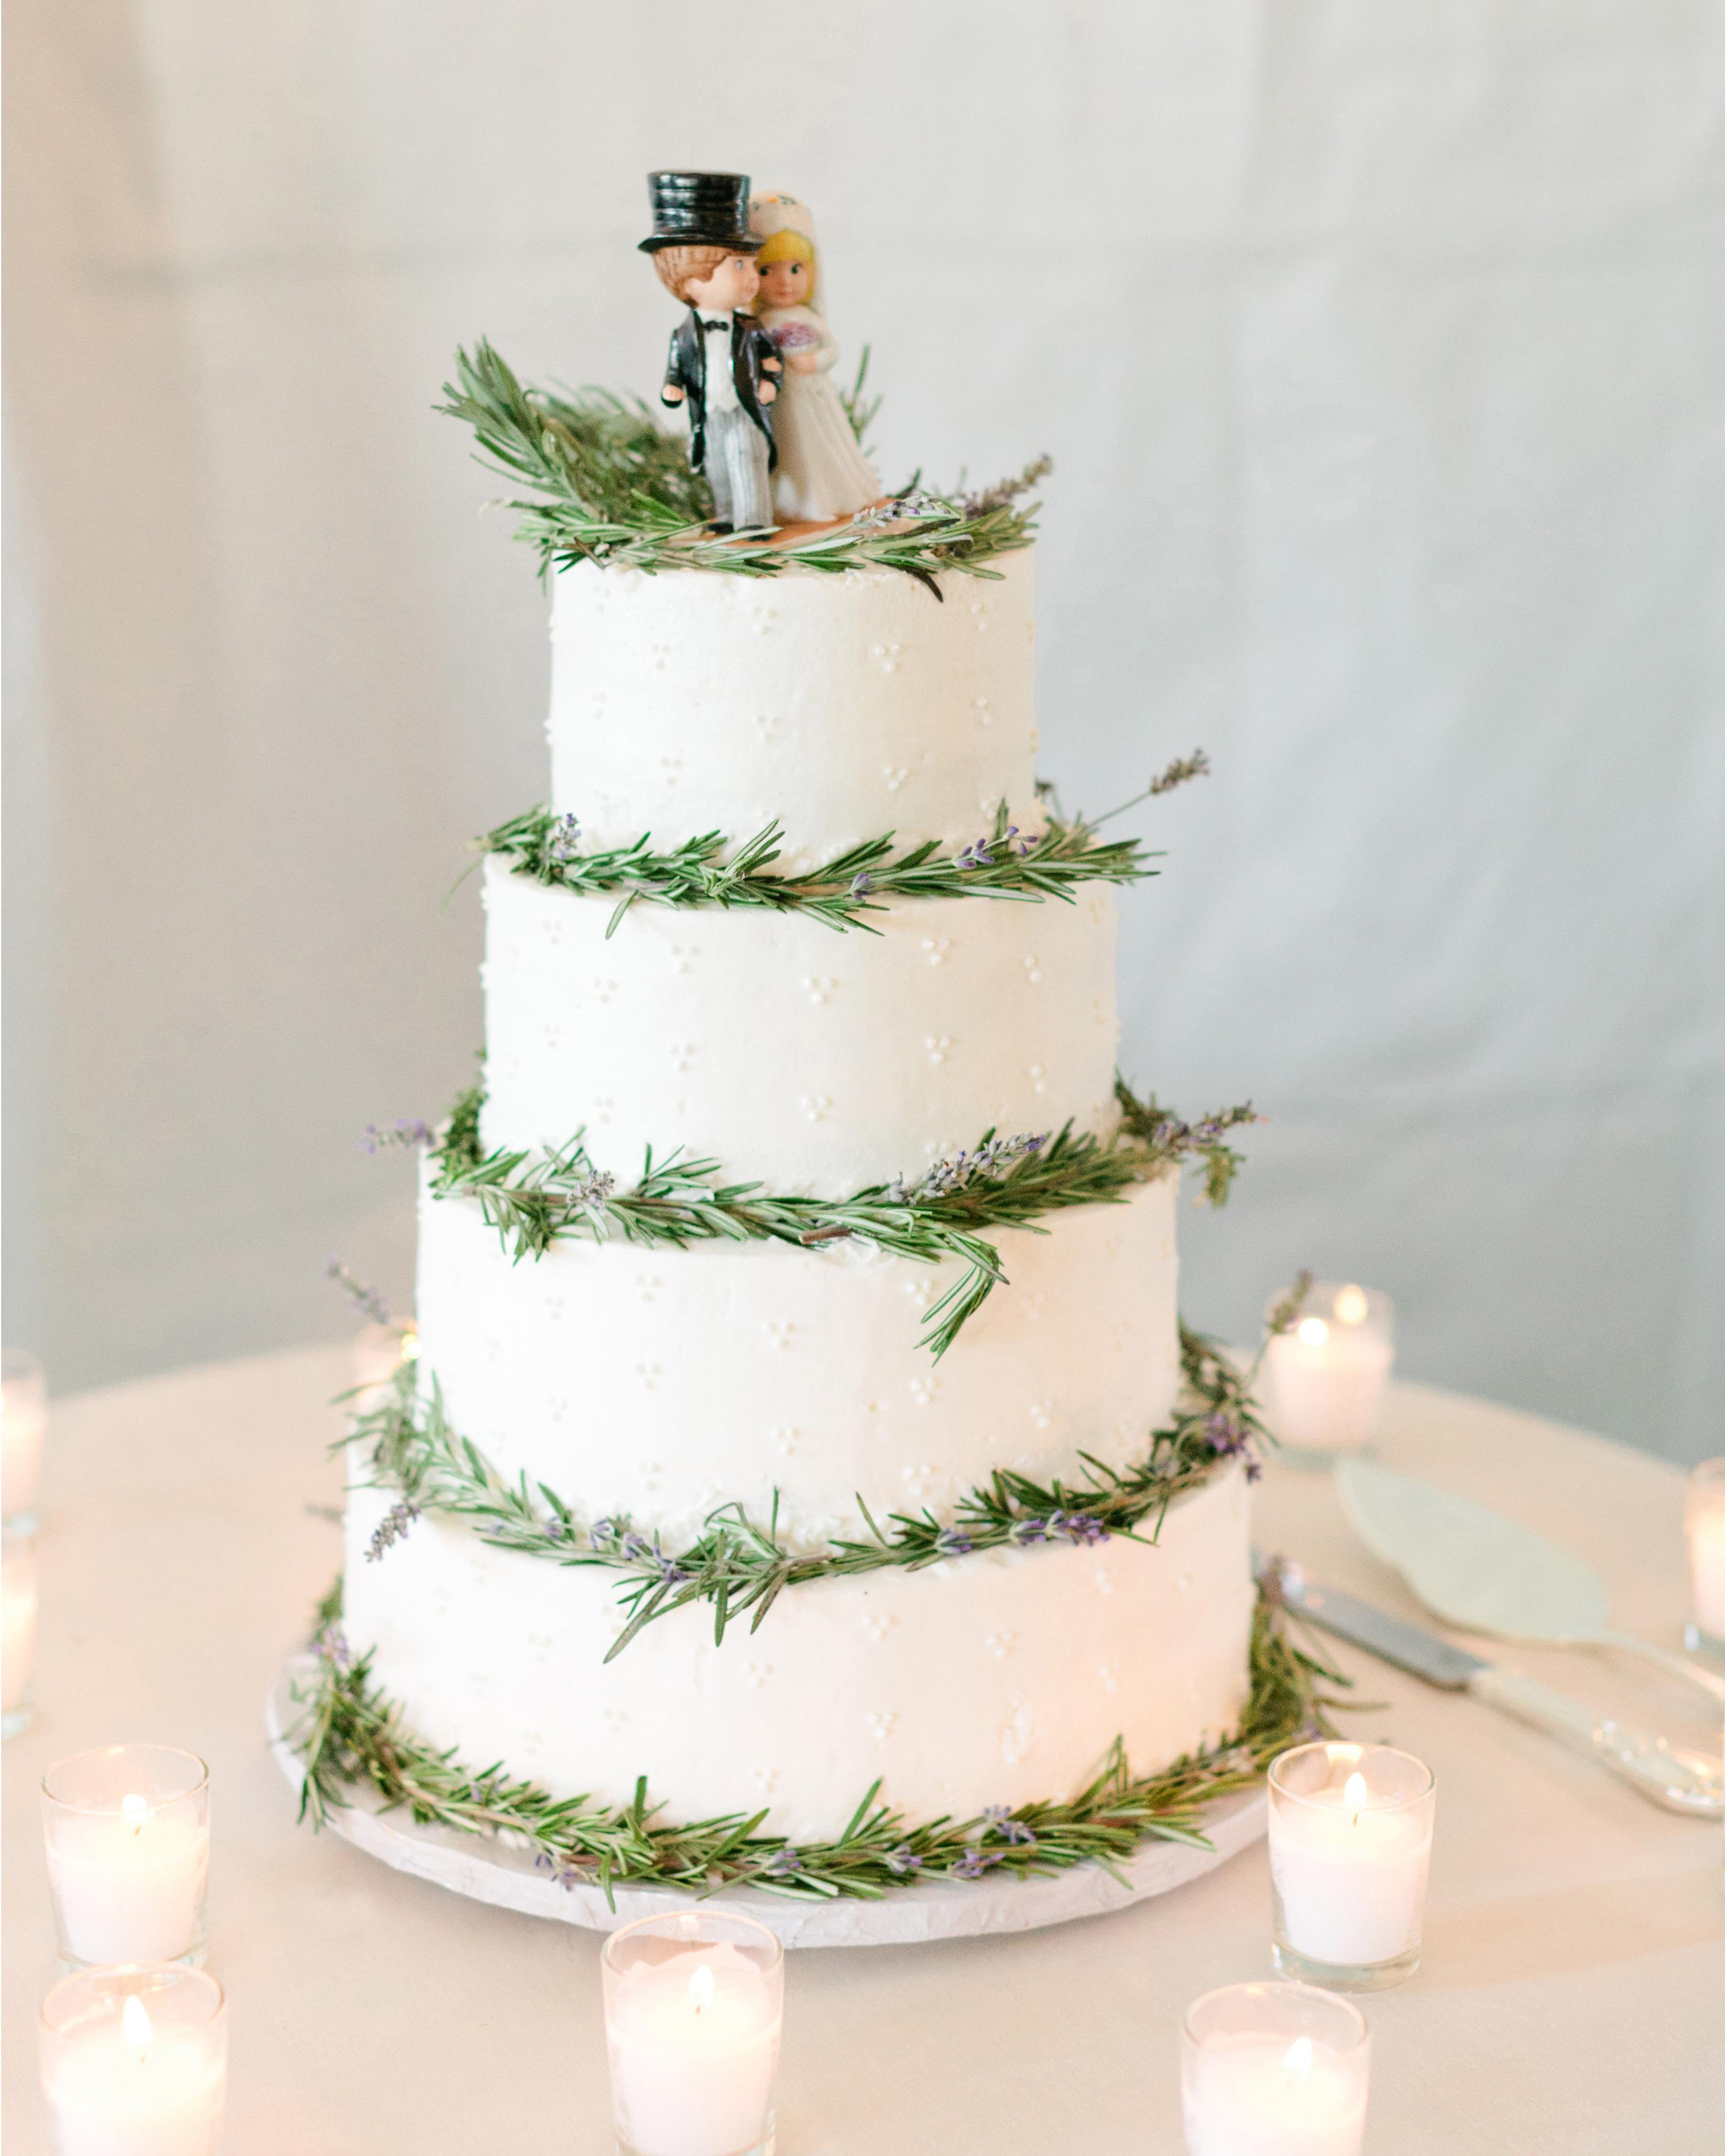 jola-tom-wedding-cake-0614.jpg